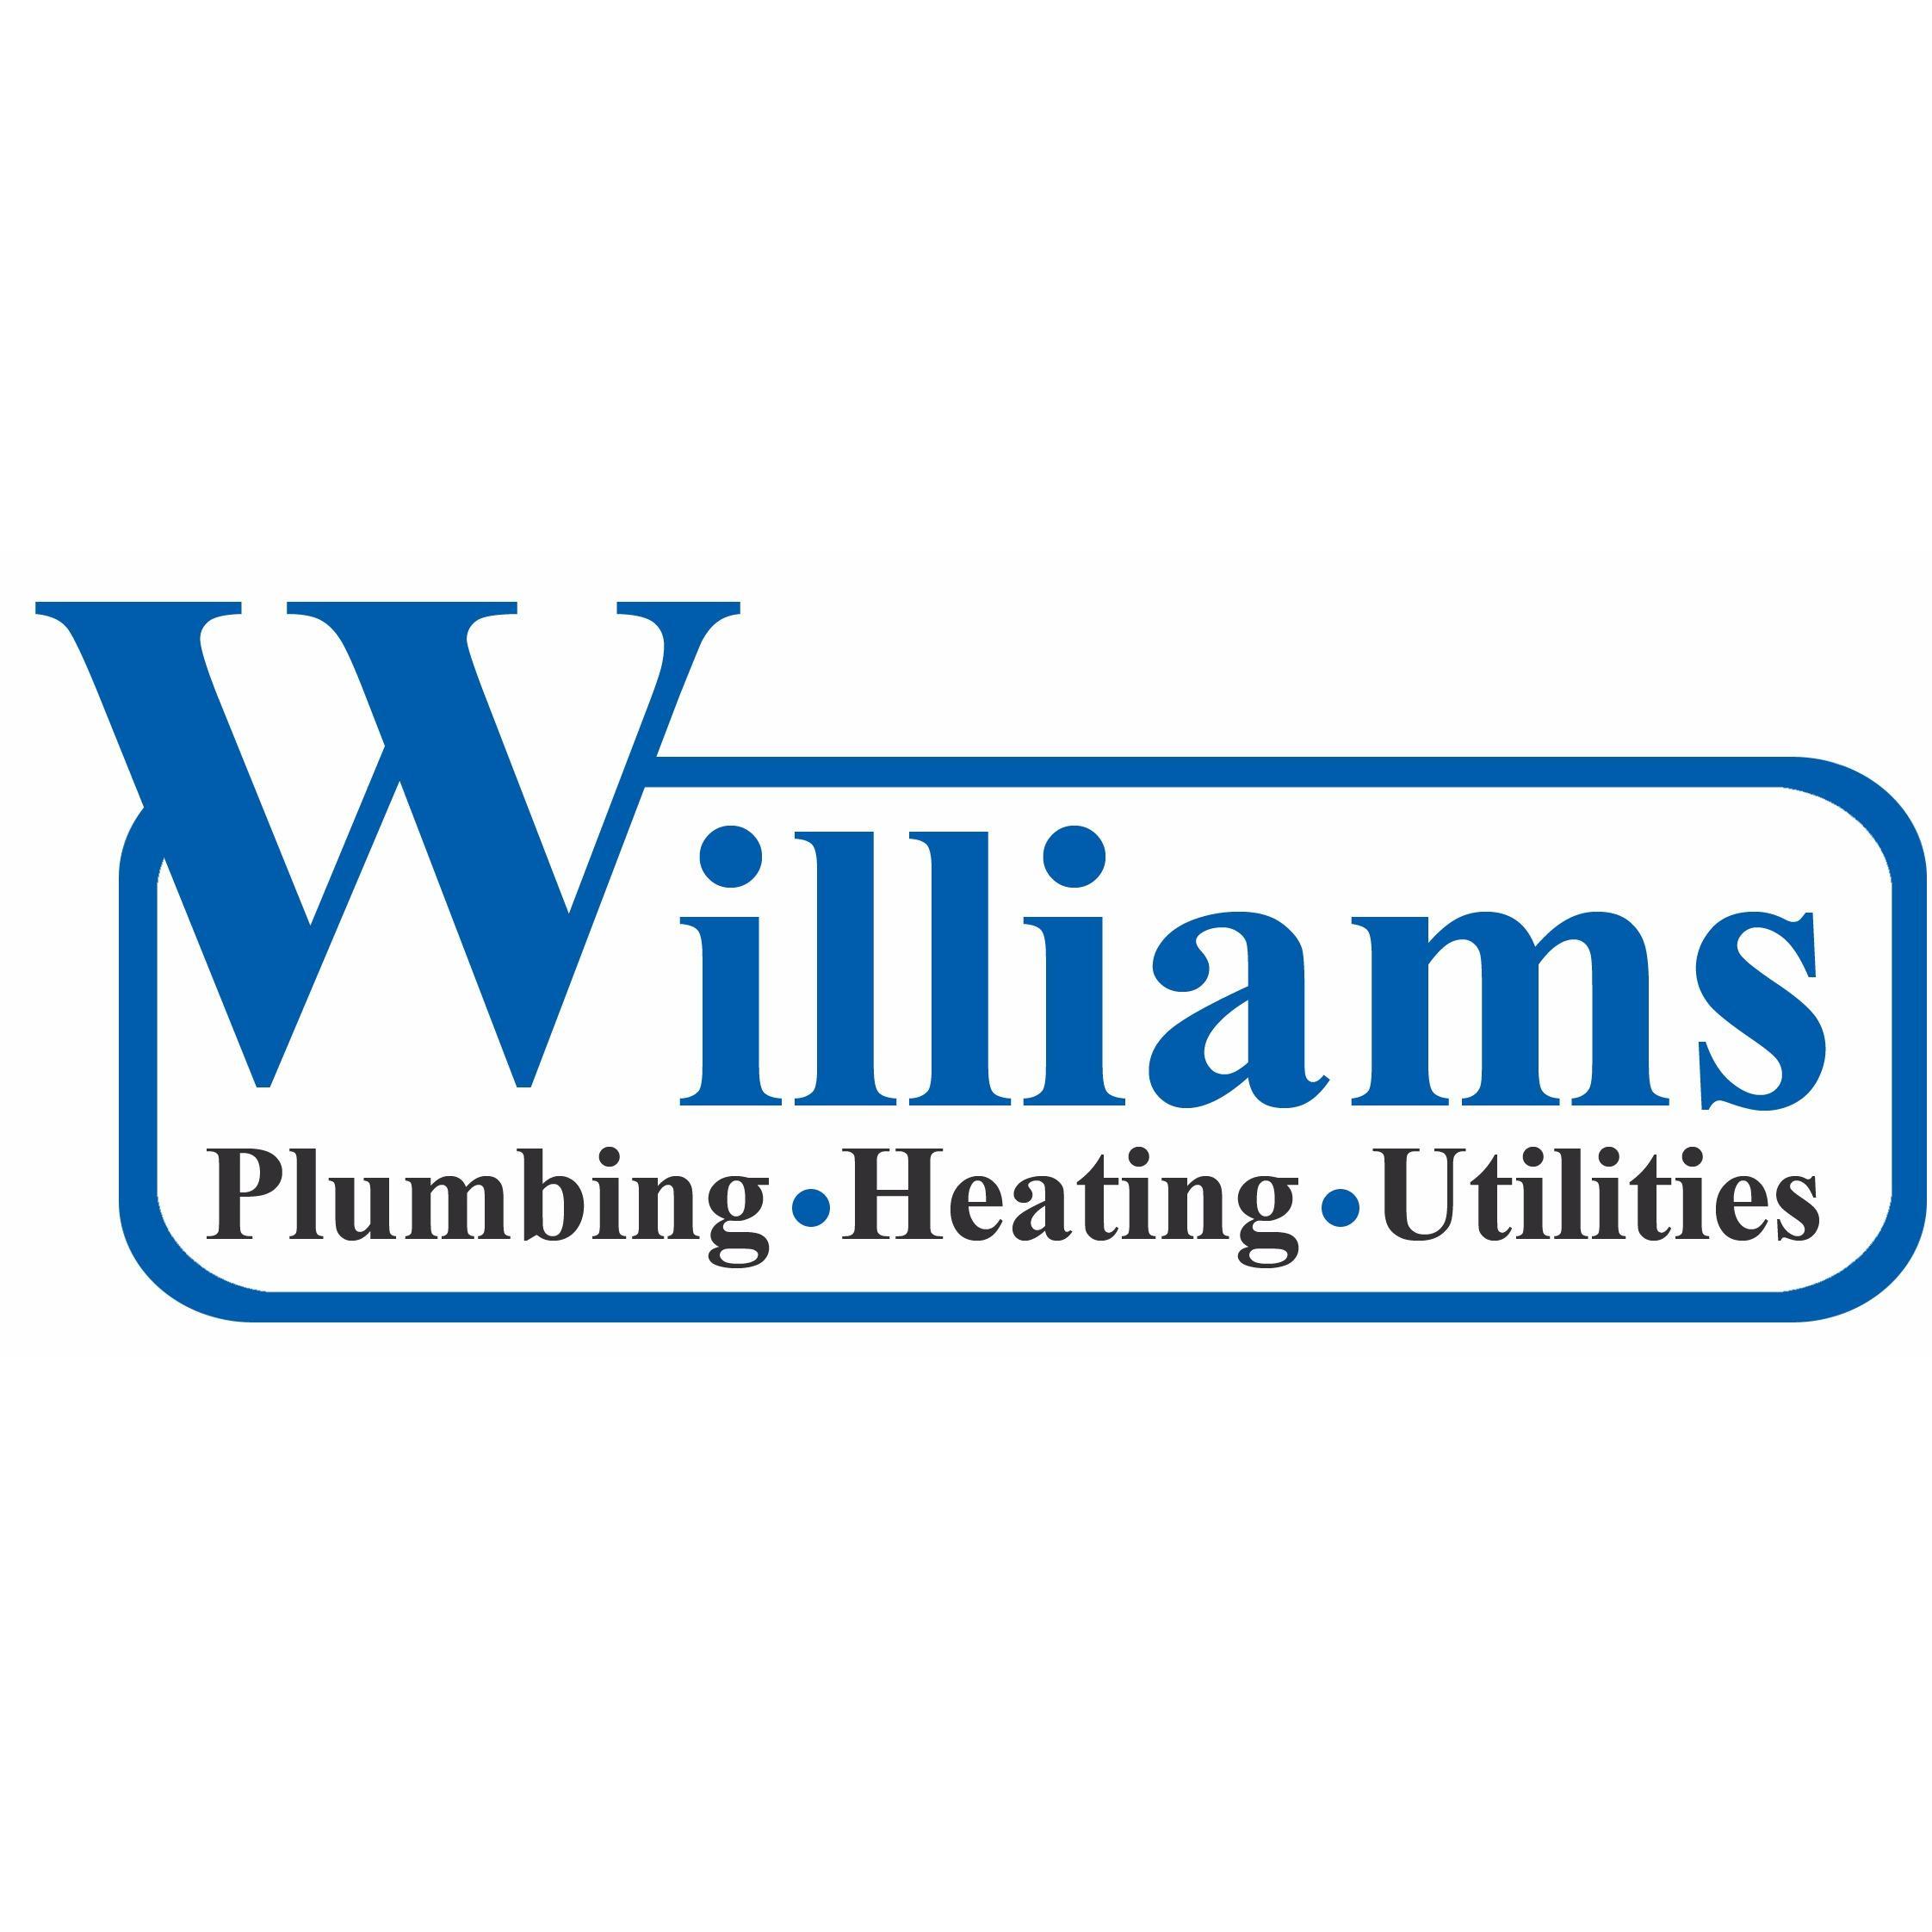 Williams Plumbing and Heating